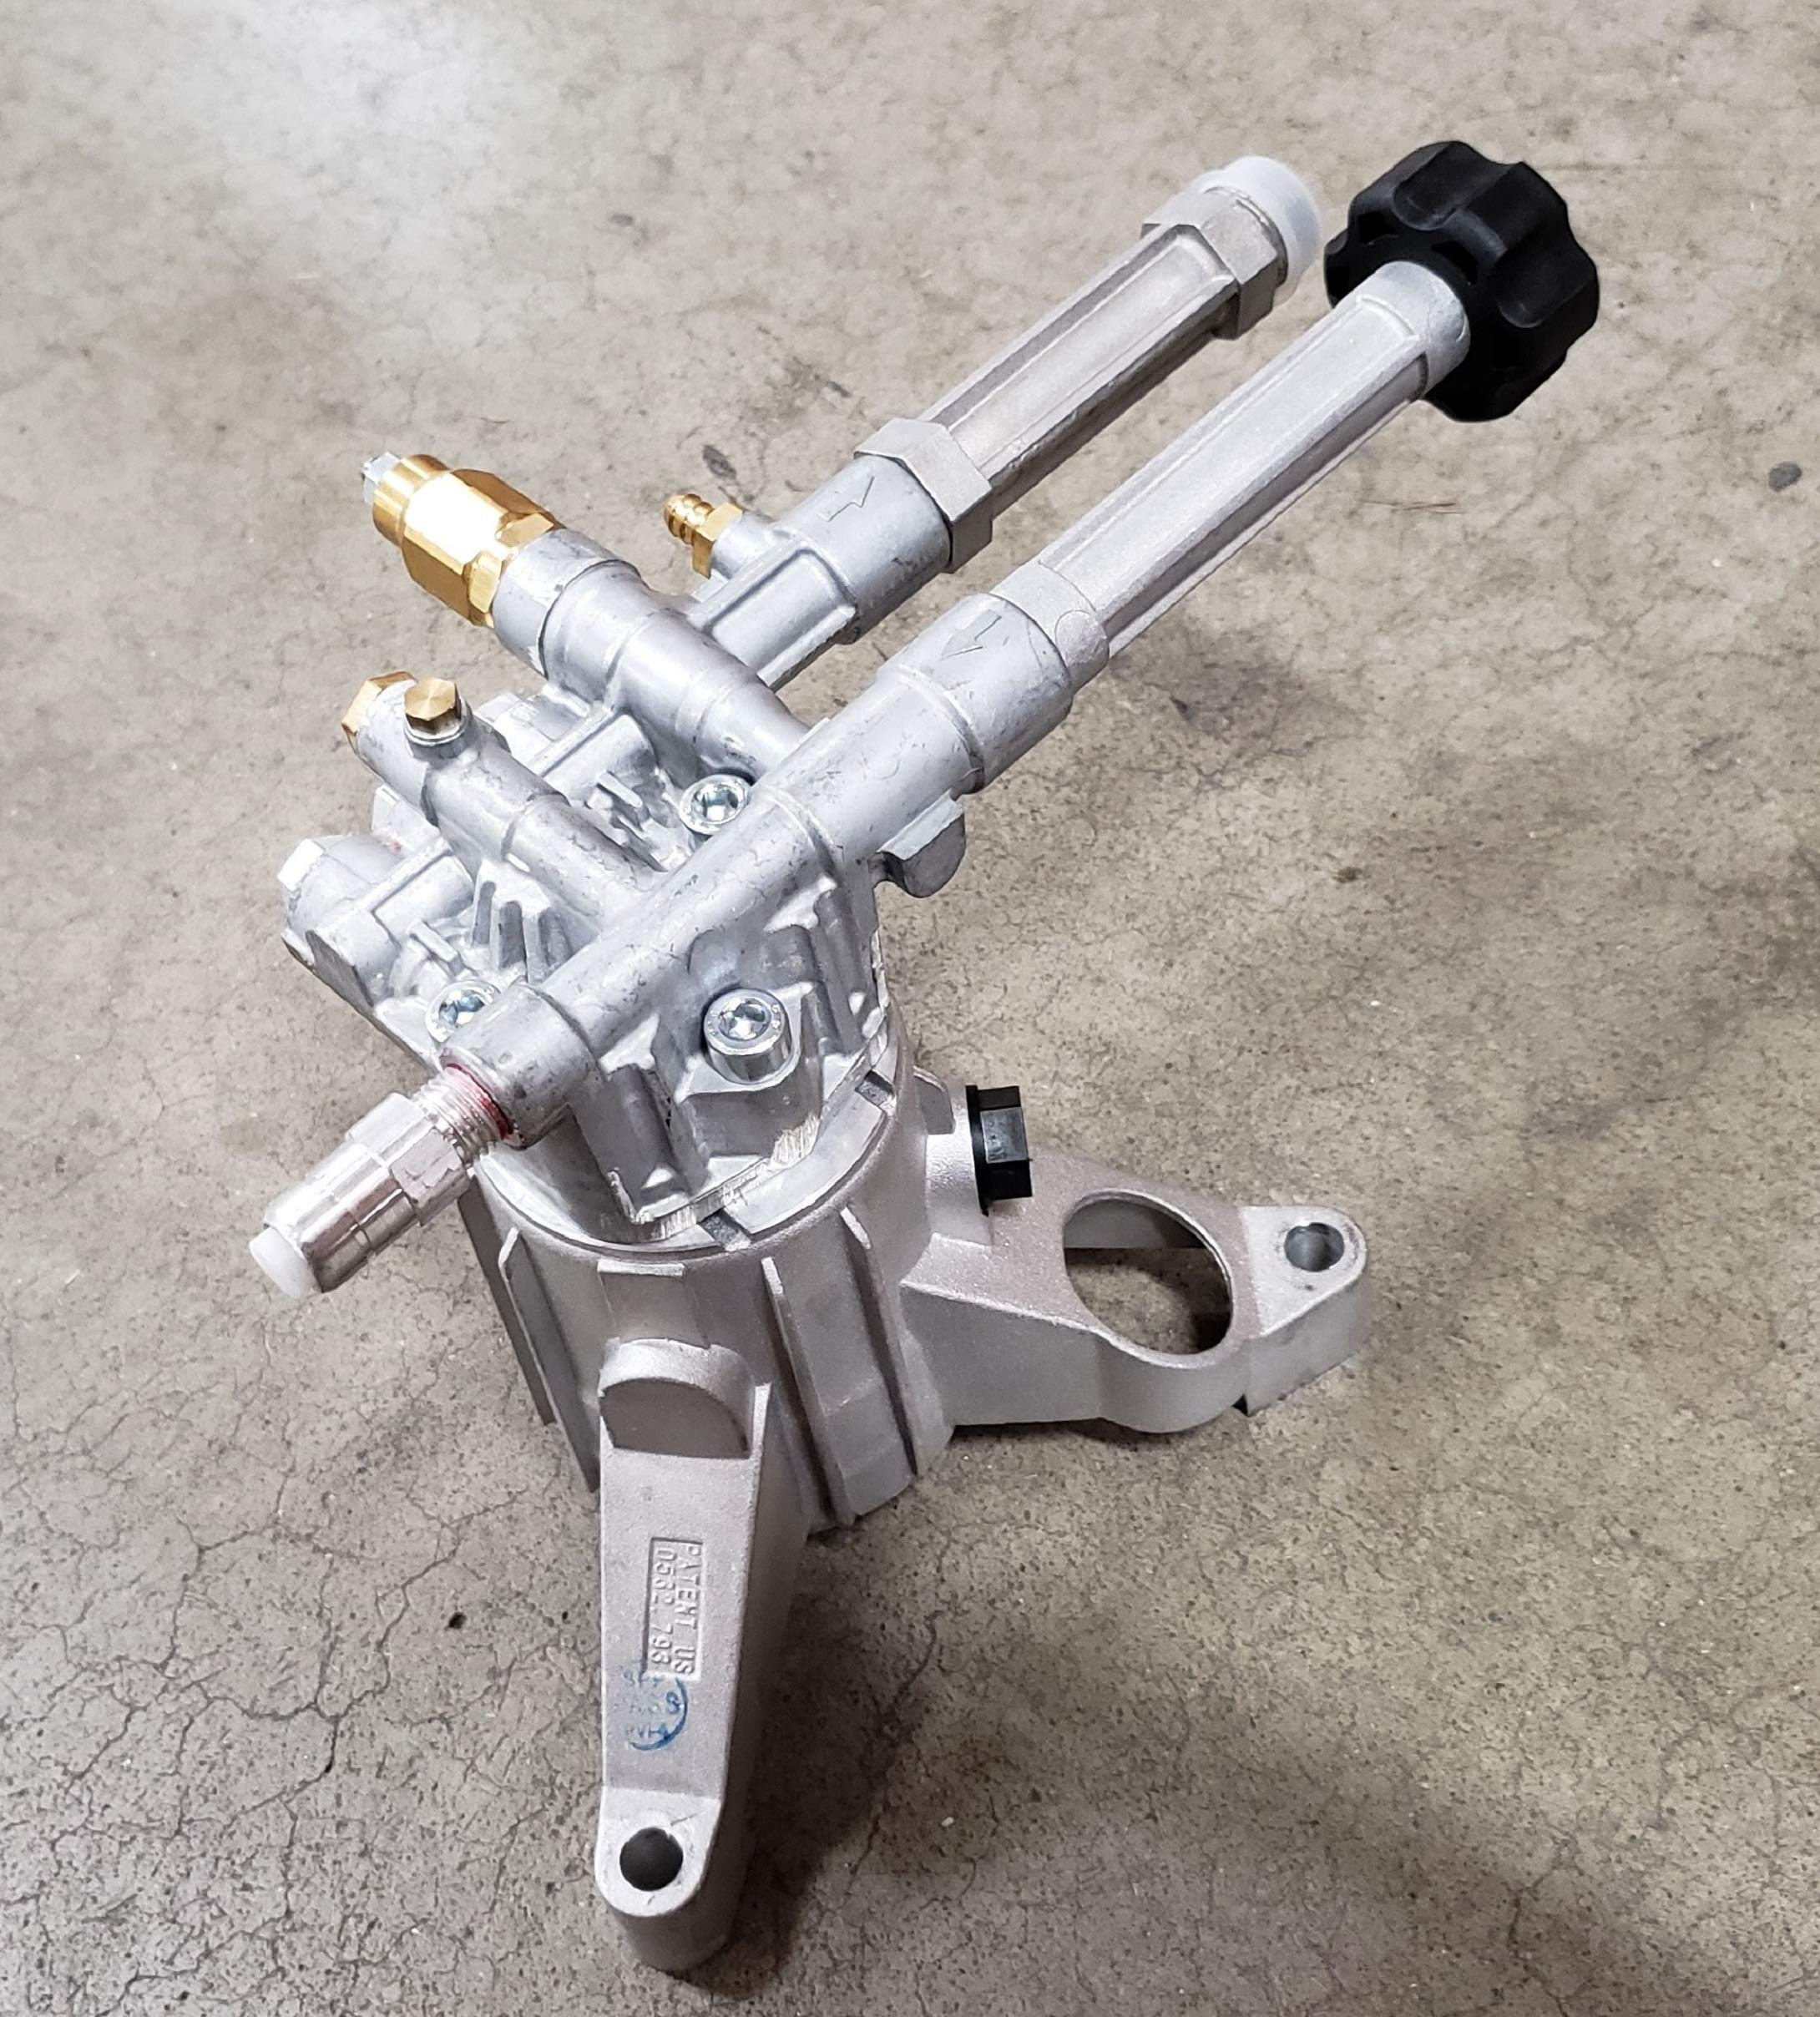 AR ANNOVI REVERBERI RMW22G24-EZ-SX, Triplex Left Handed, Easy Start, 2400 Psi, 2Gpm Plunger Vertical Pumps, Aluminum